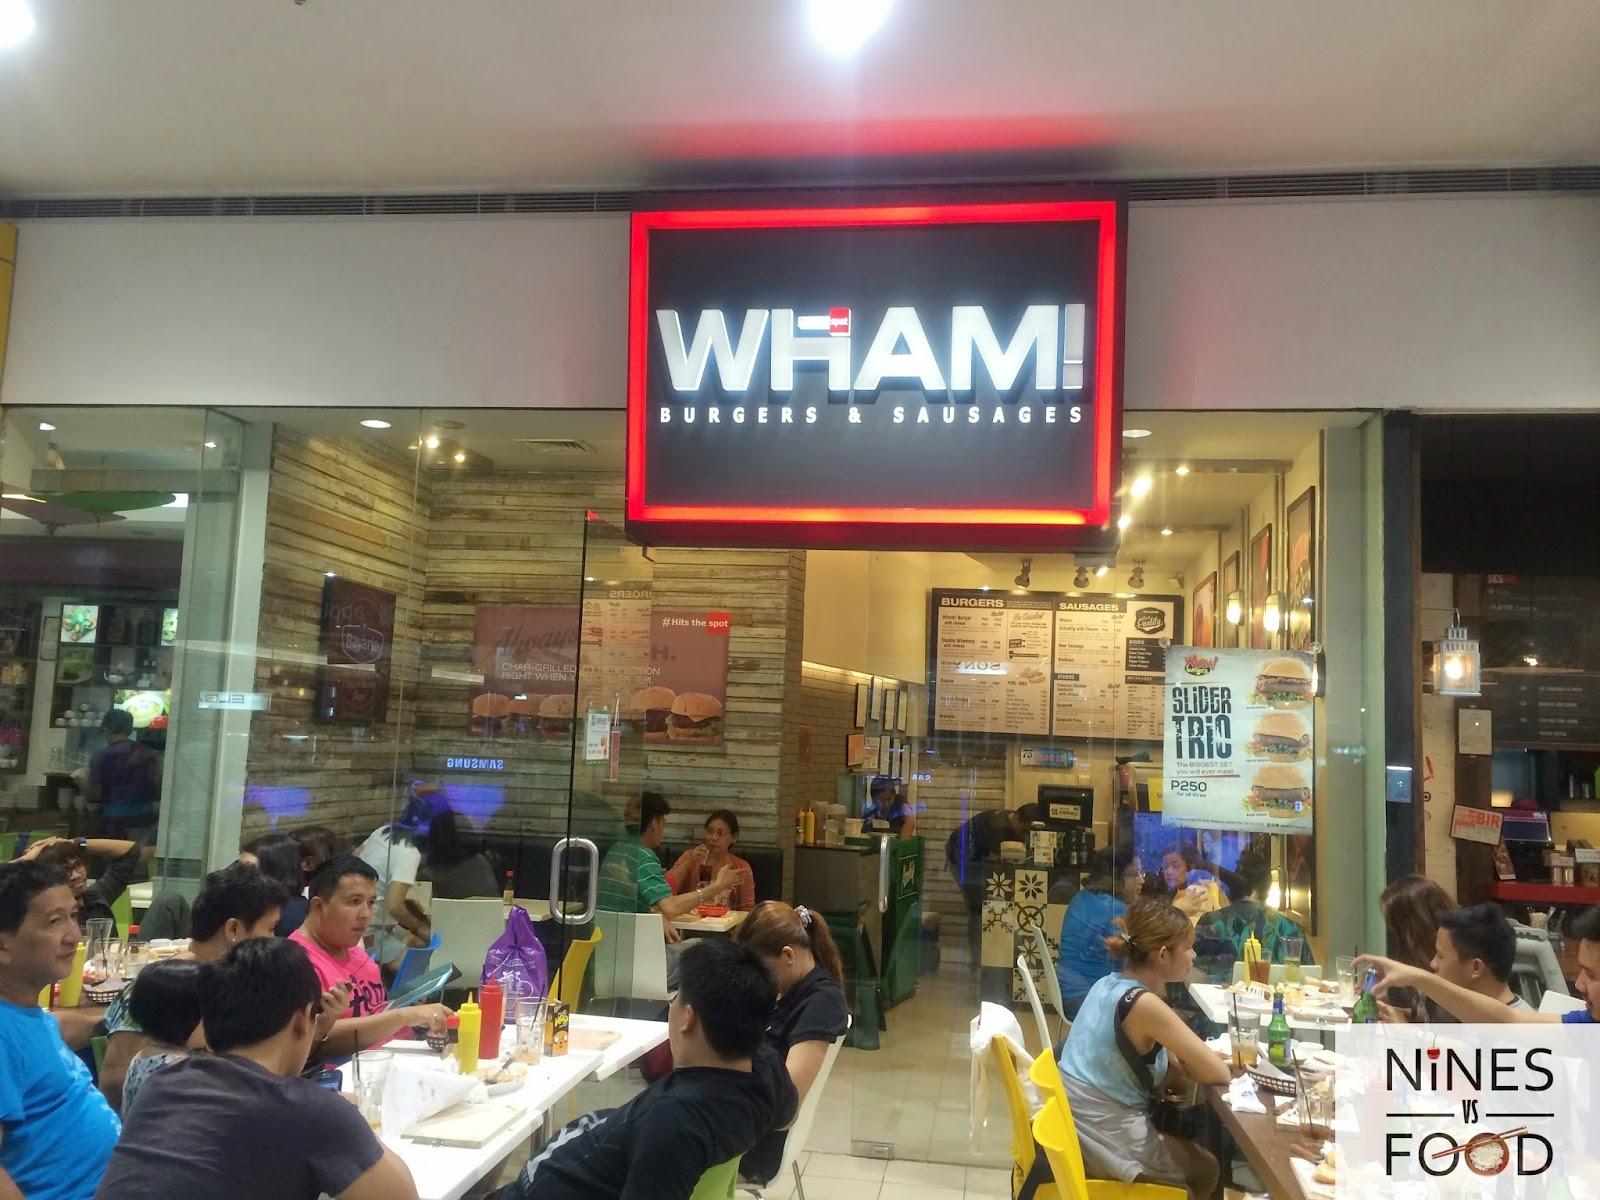 Nines vs Food - Wham! Burgers and Sausages-1.jpg